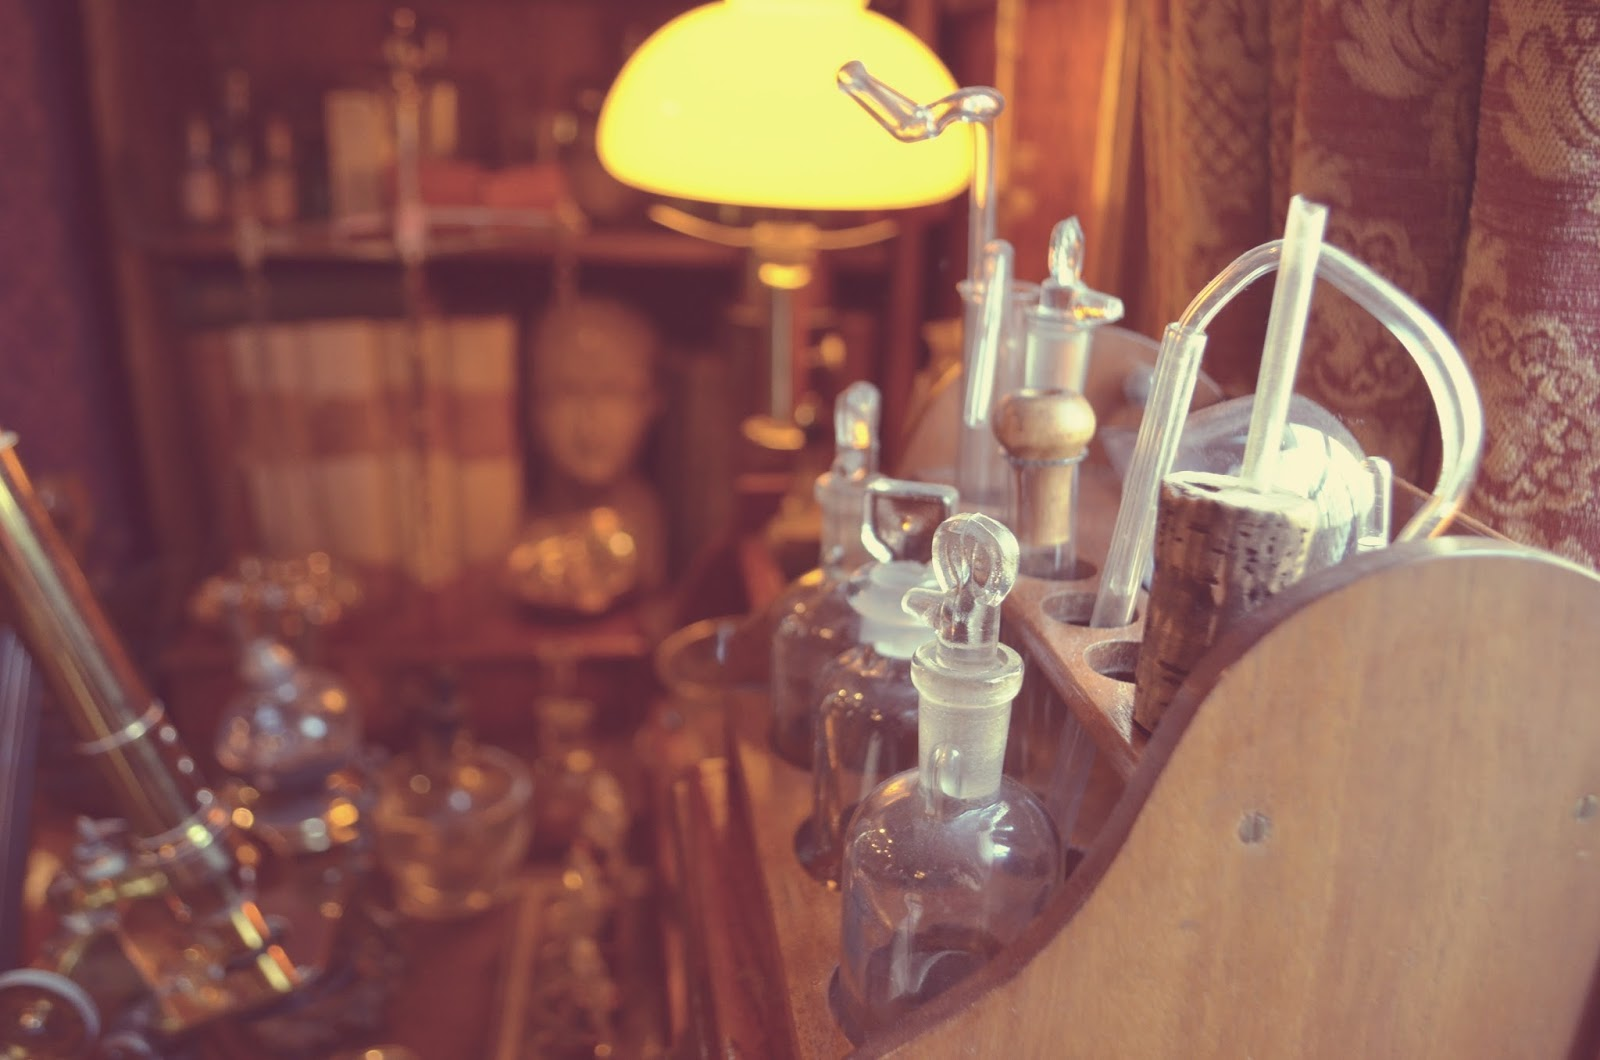 Sherlock Holmes Scientist bottles